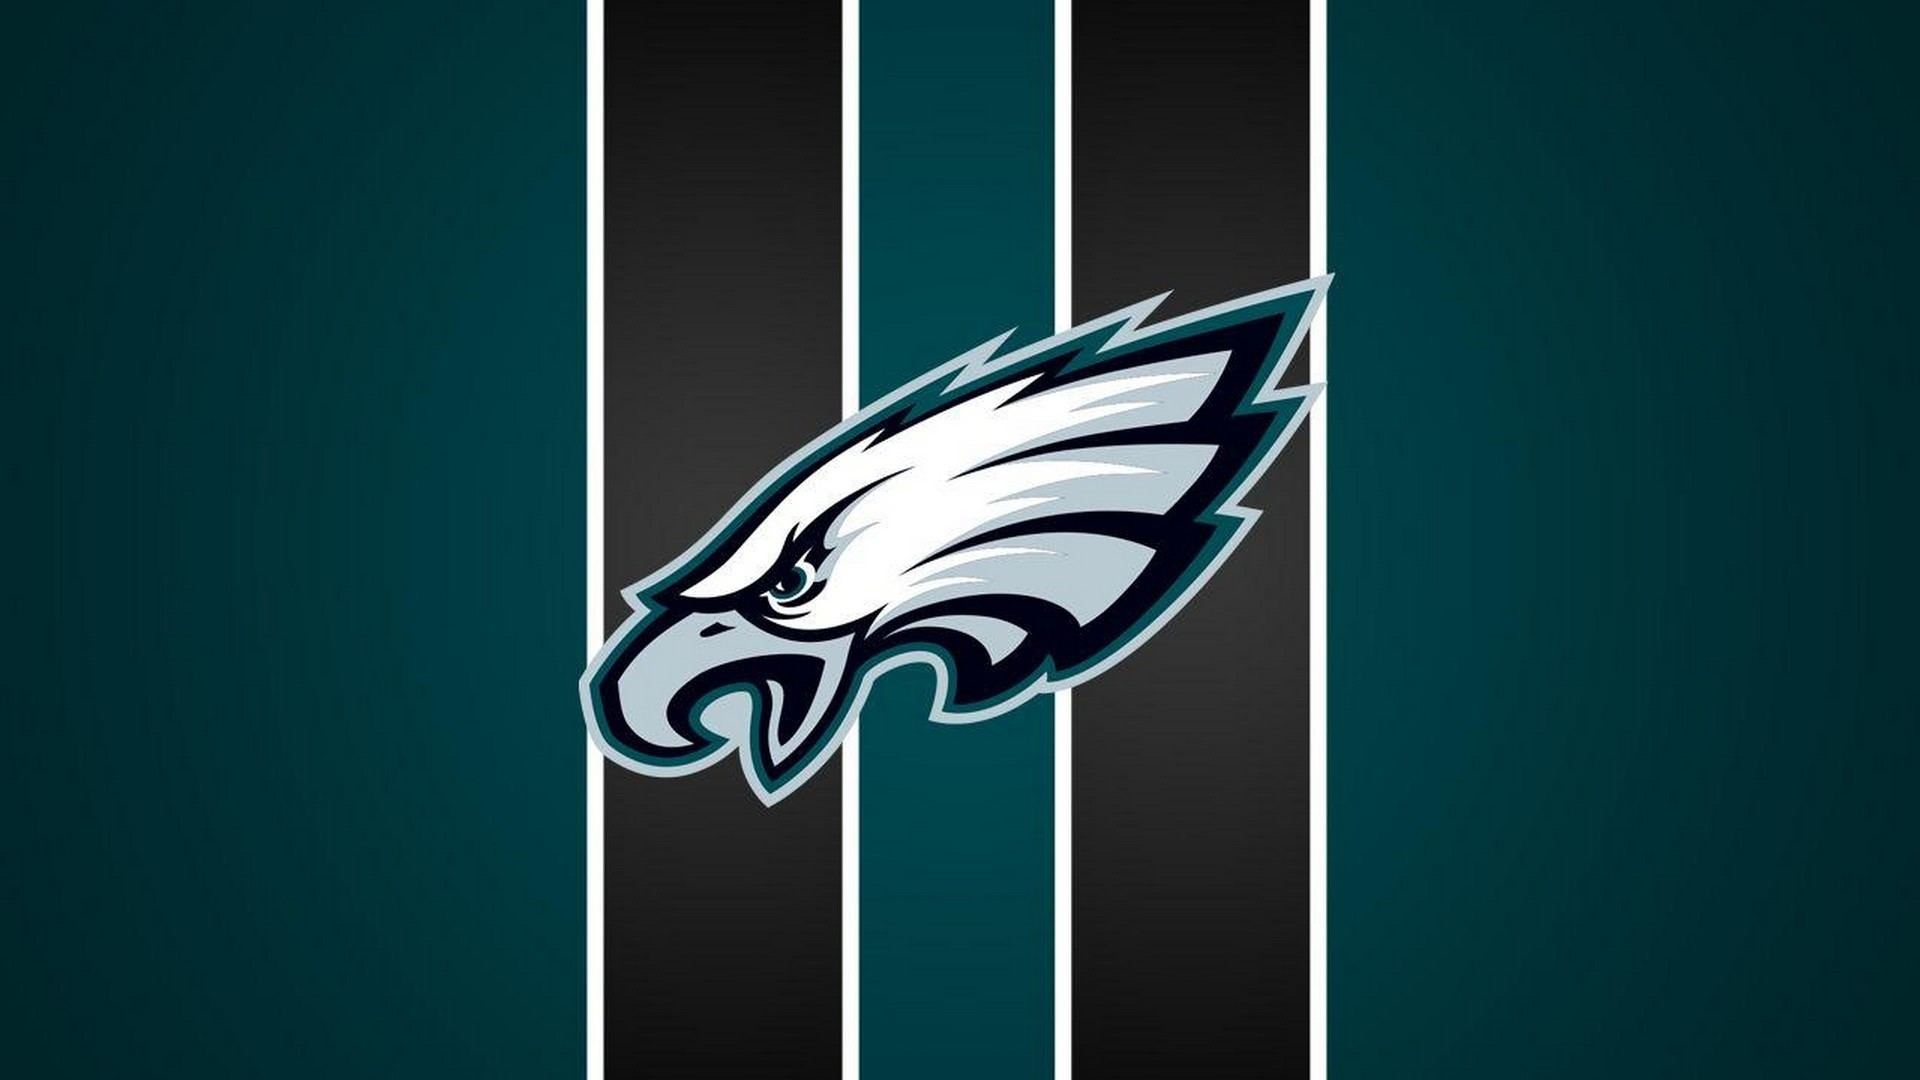 Philadelphia Eagles hd desktop wallpaper